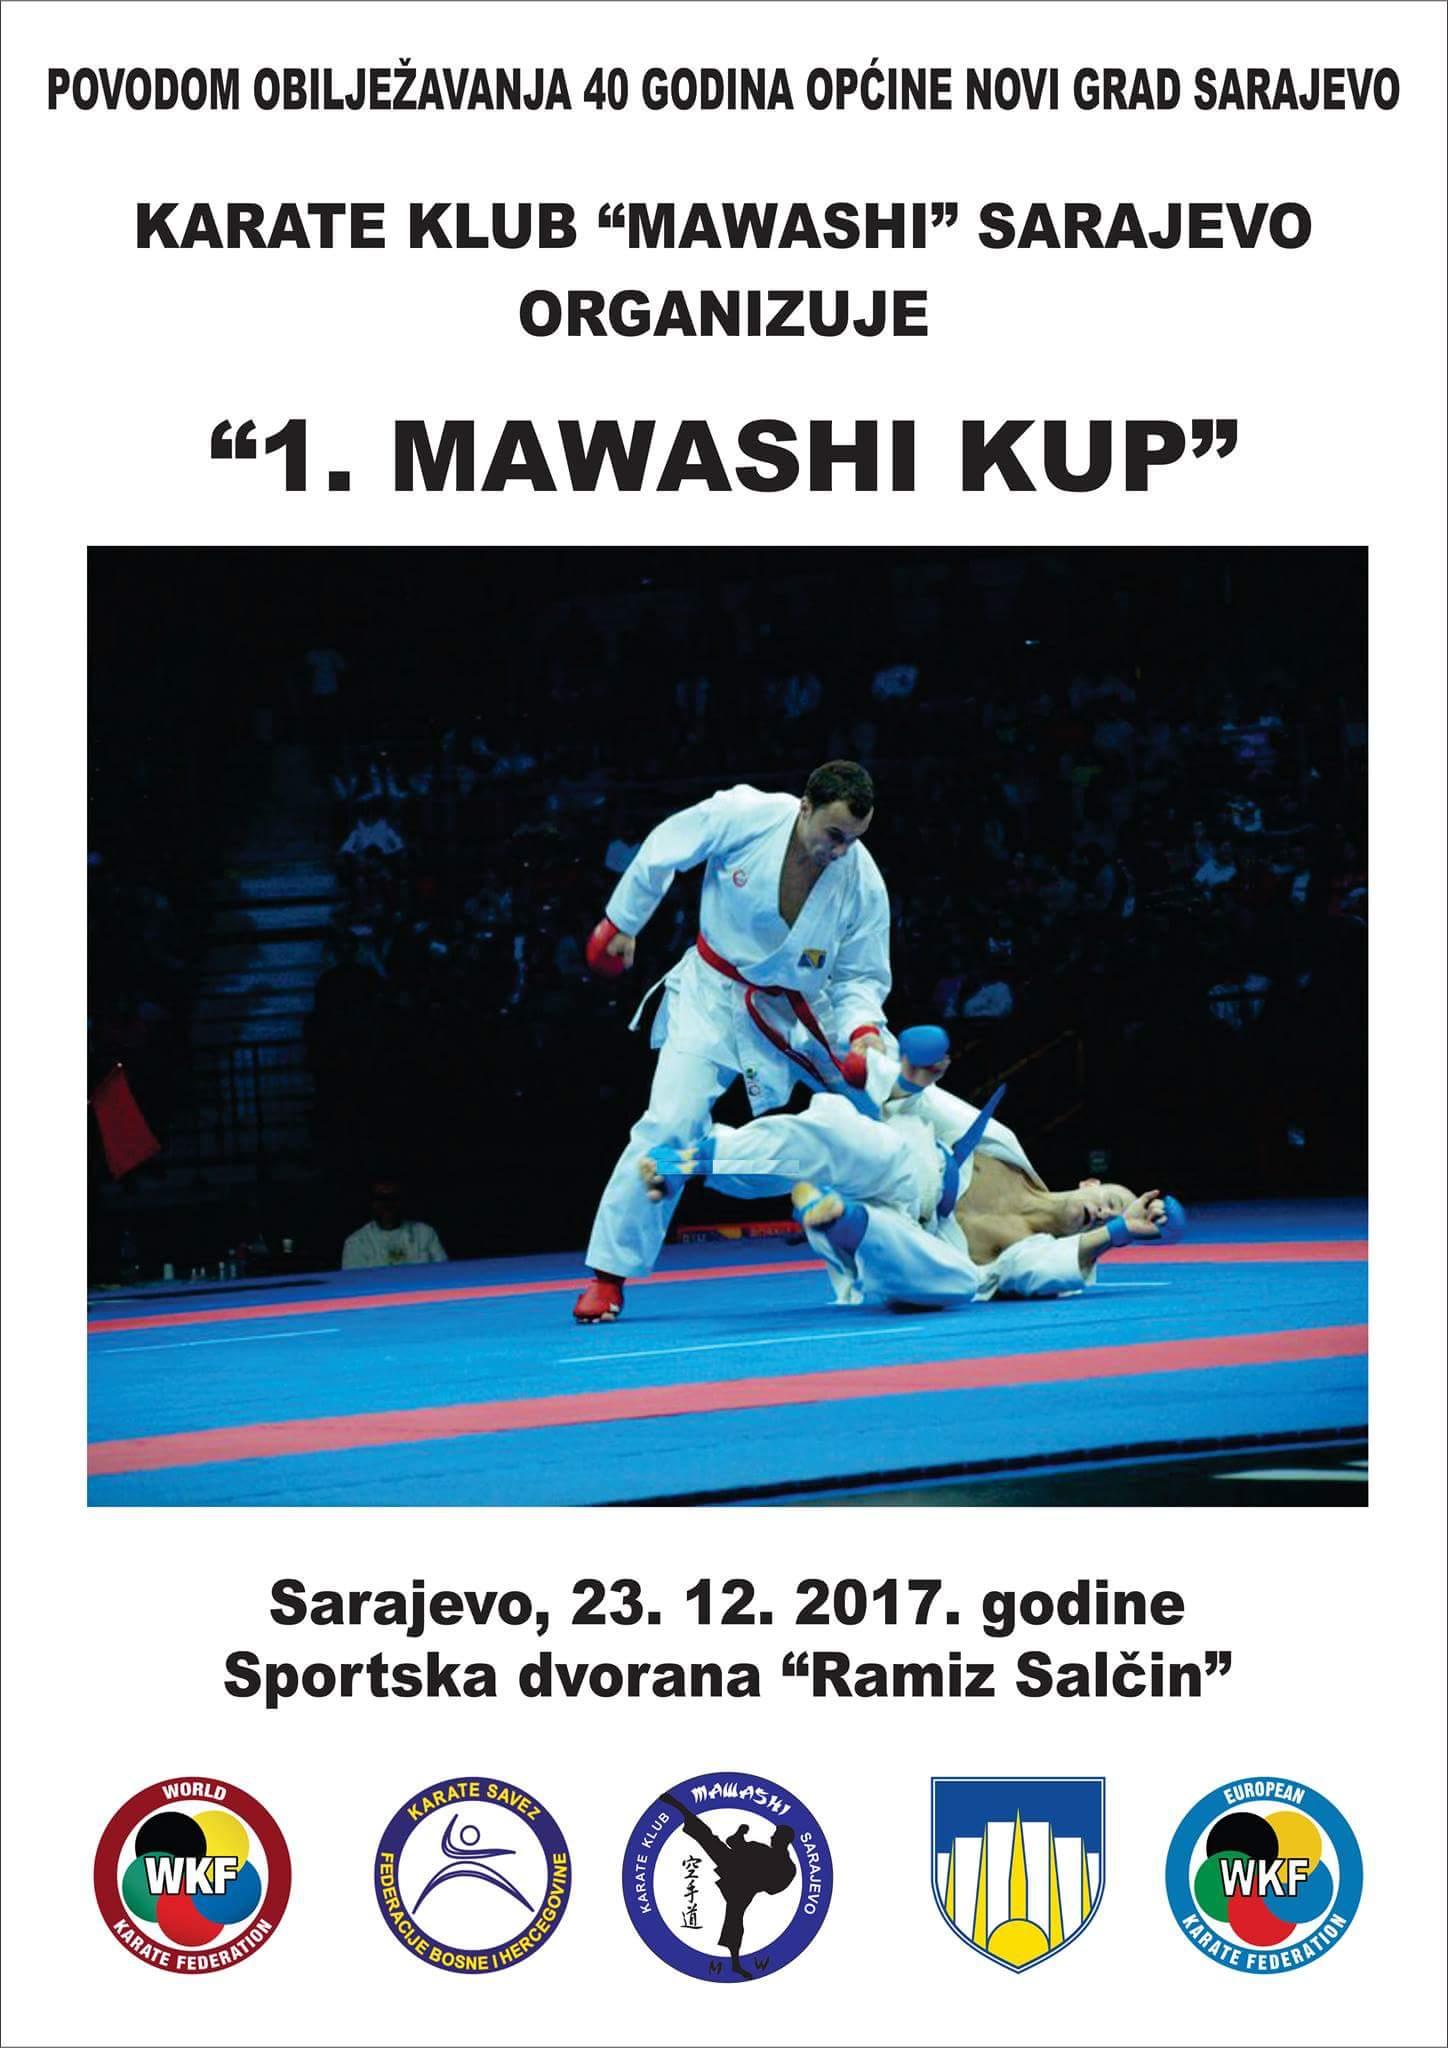 1. Mawashi kup